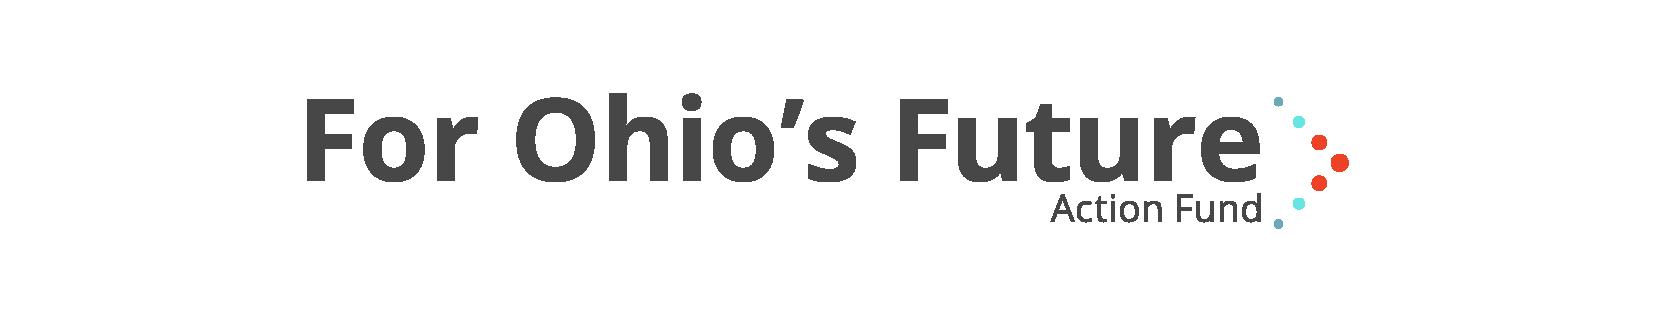 For Ohio's Future